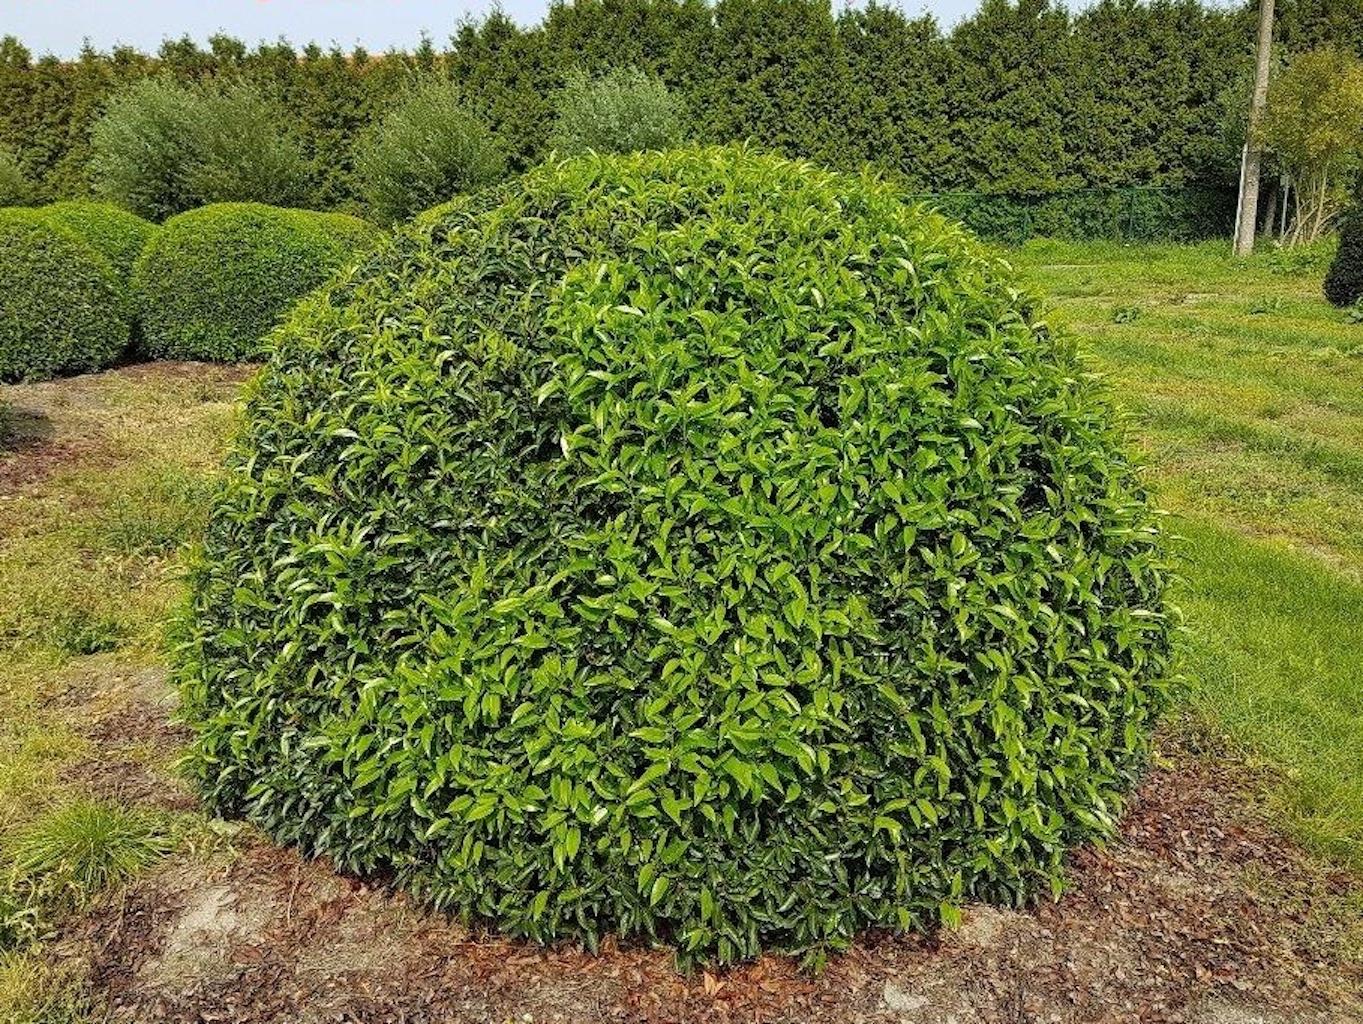 Prunus lusitanica 'Angustifolia' topiary ball 200-220cm diameter